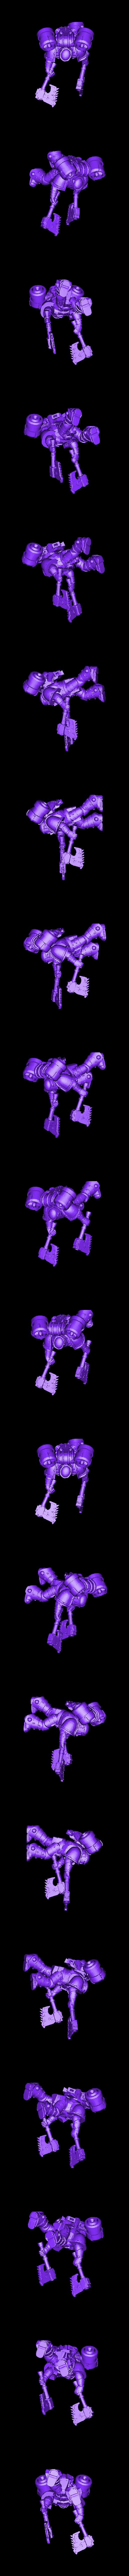 MK2_chainaxe_assault_8.stl Download free STL file Marine assault squad Eaters of Worlds • 3D printer template, KarnageKing